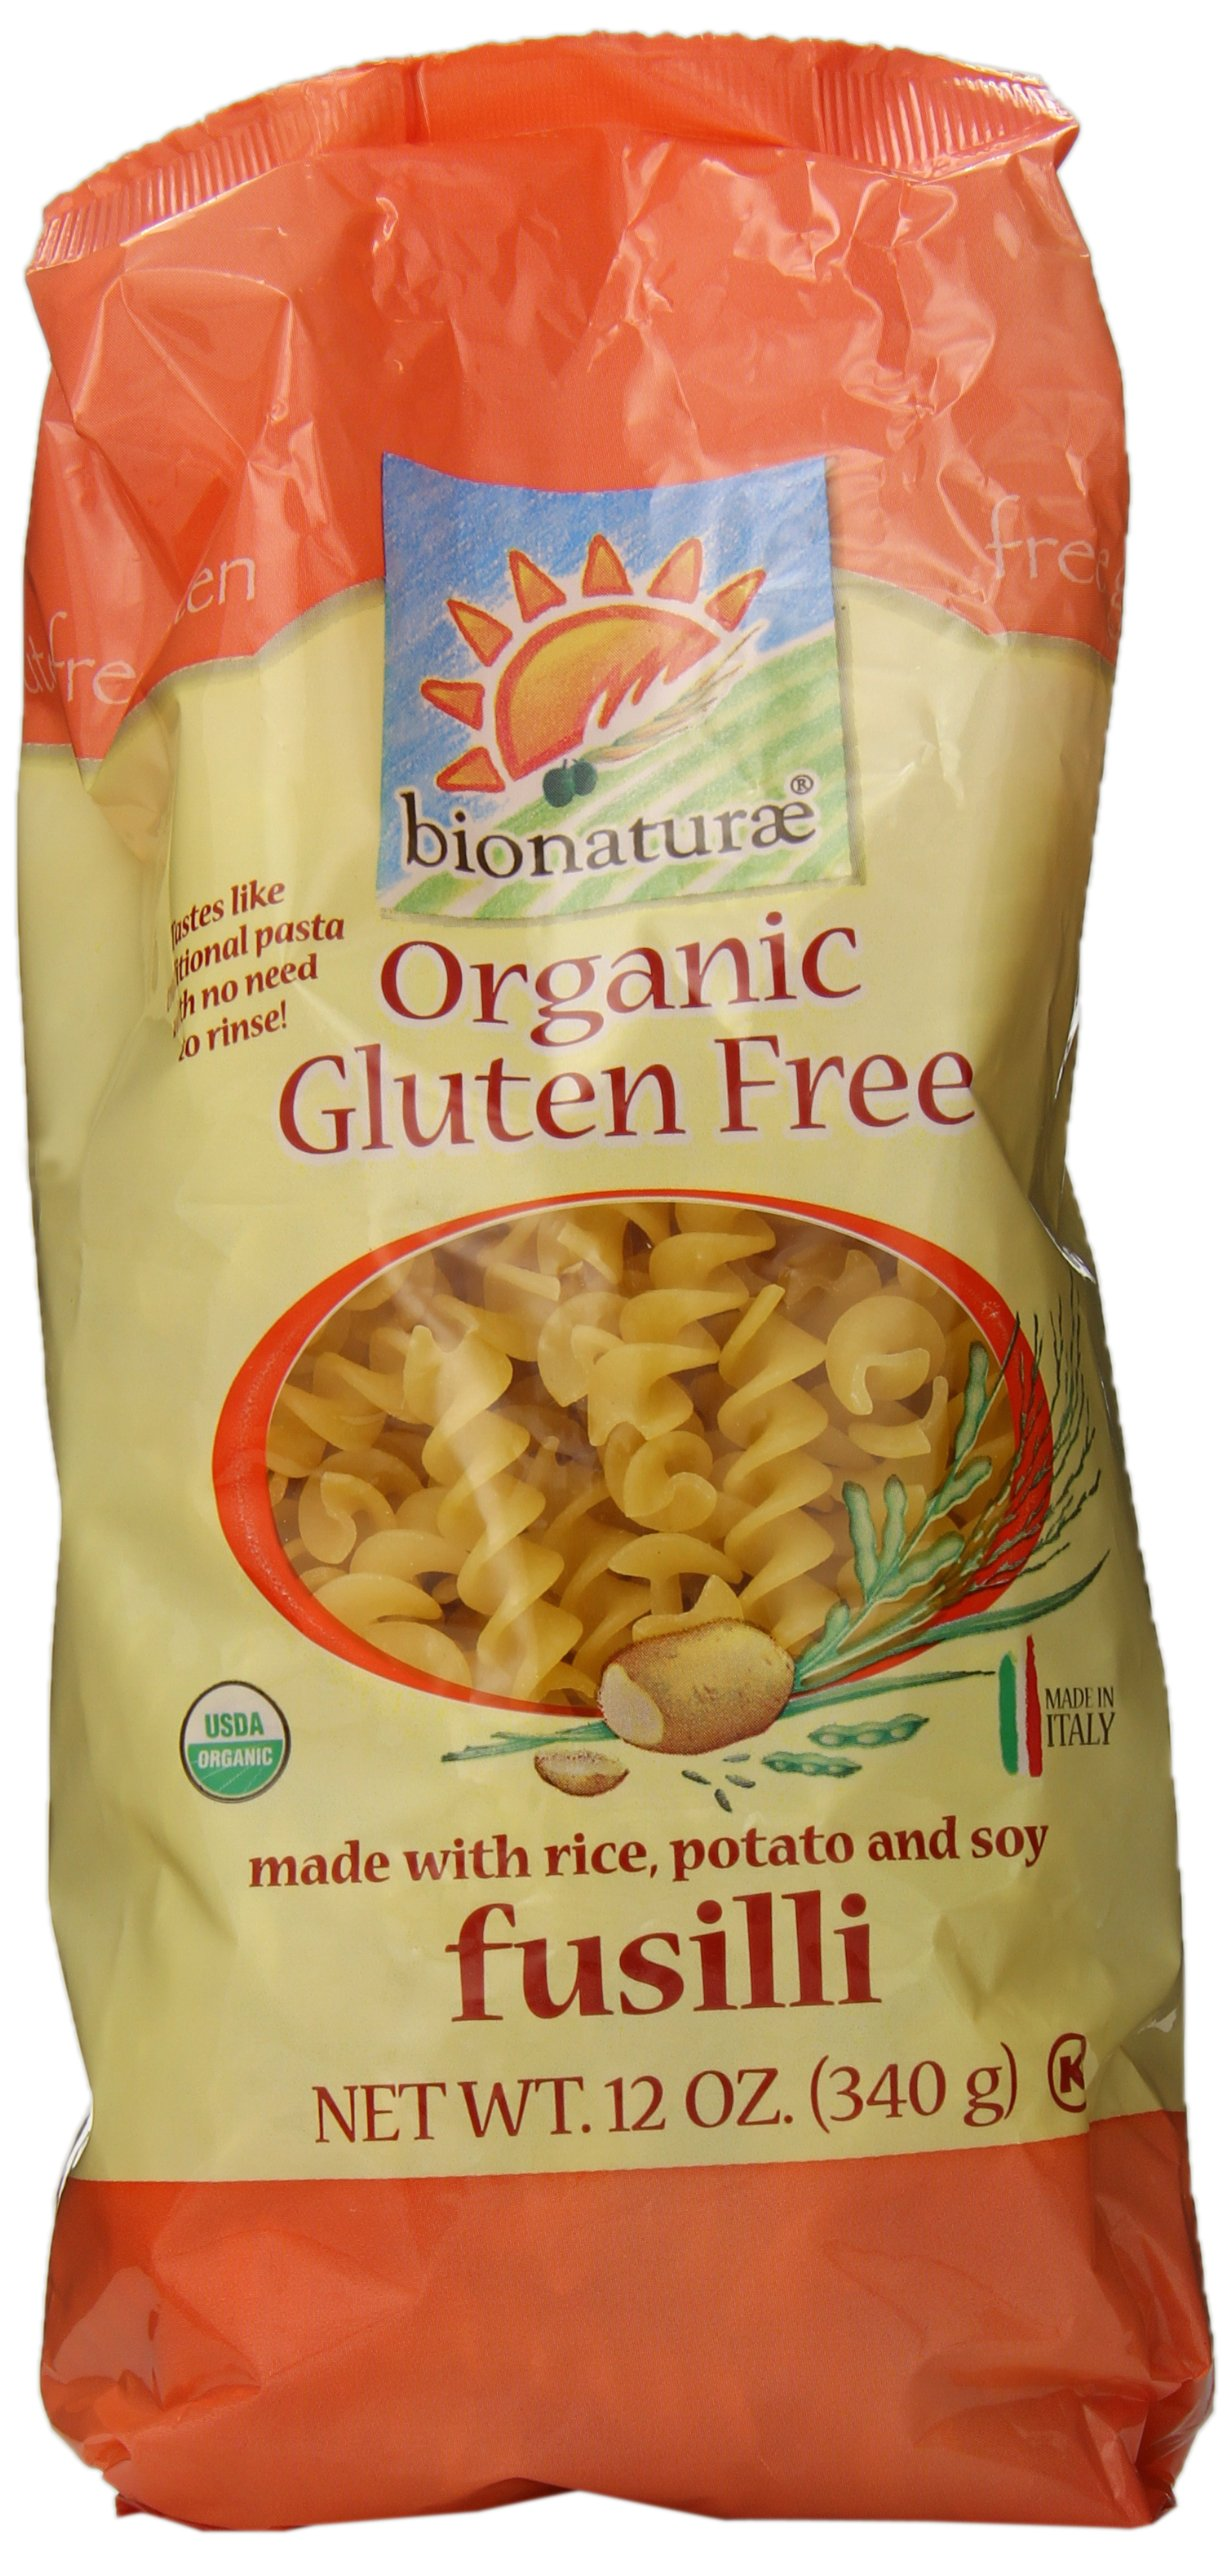 bionaturae Organic Fusilli, Gluten Free, 12 Ounce Bags (Pack of 12) by bionaturae